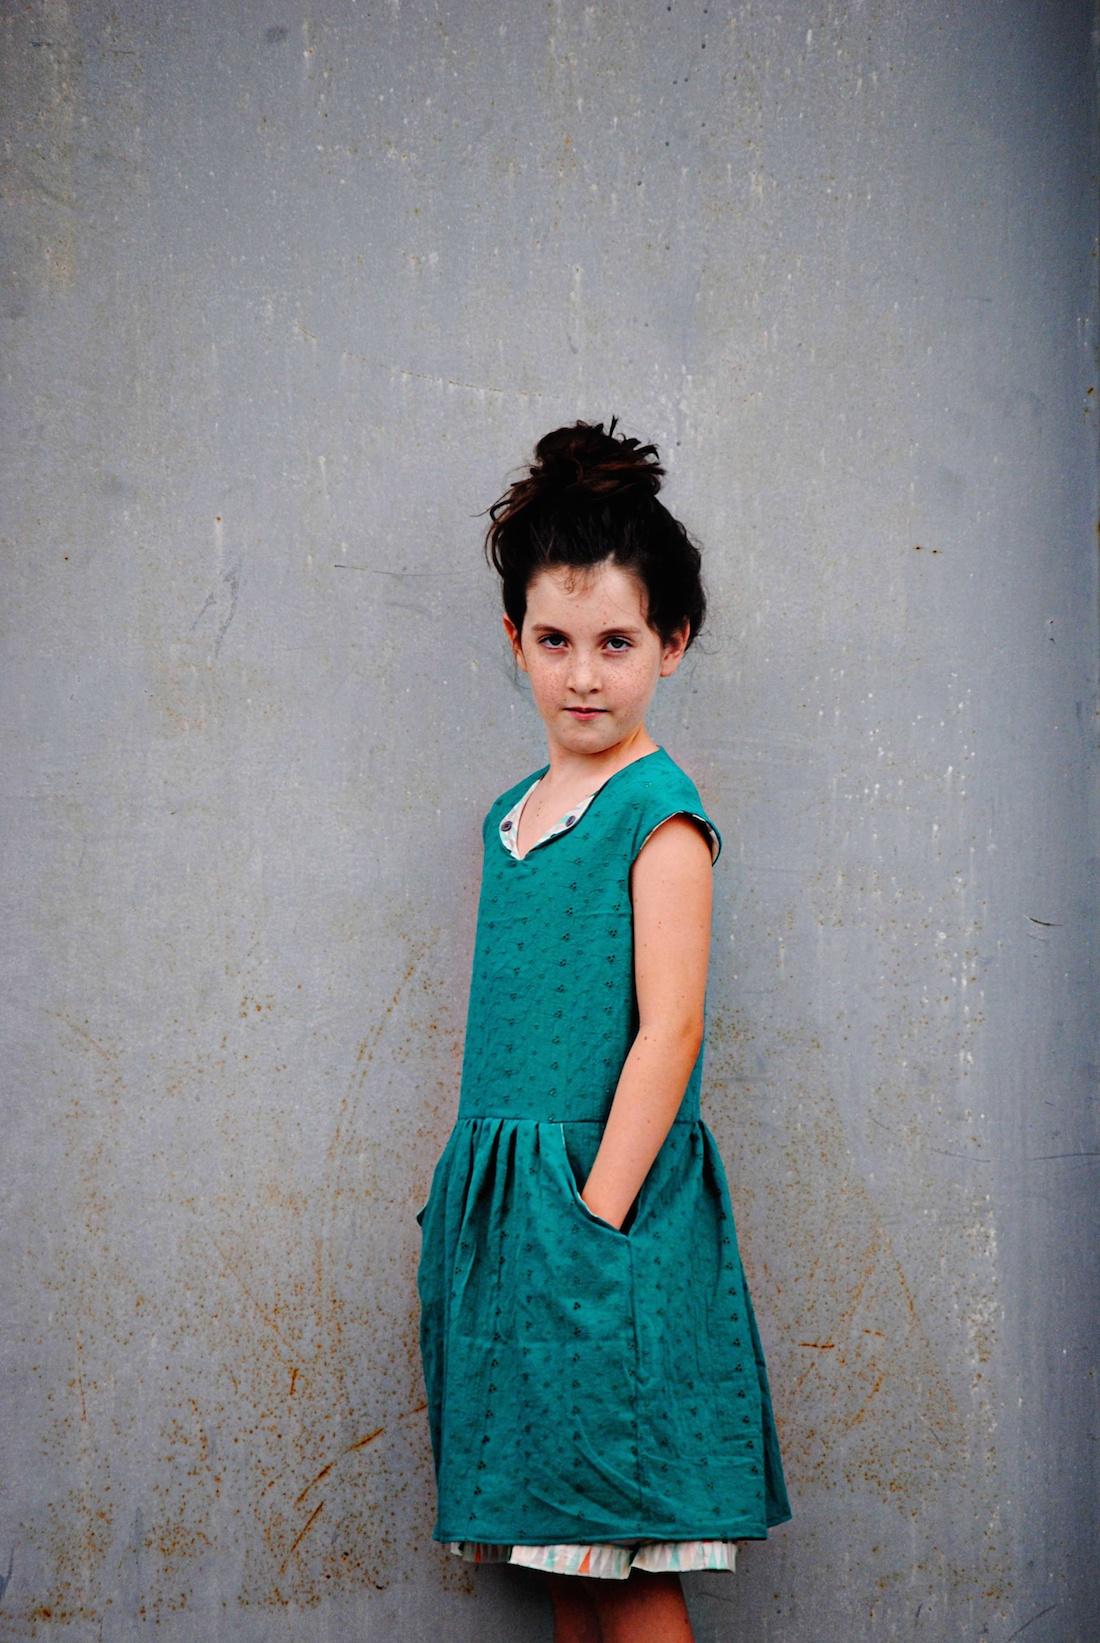 Compagnie-M_Lotta_dress_Dandeliondrift 3